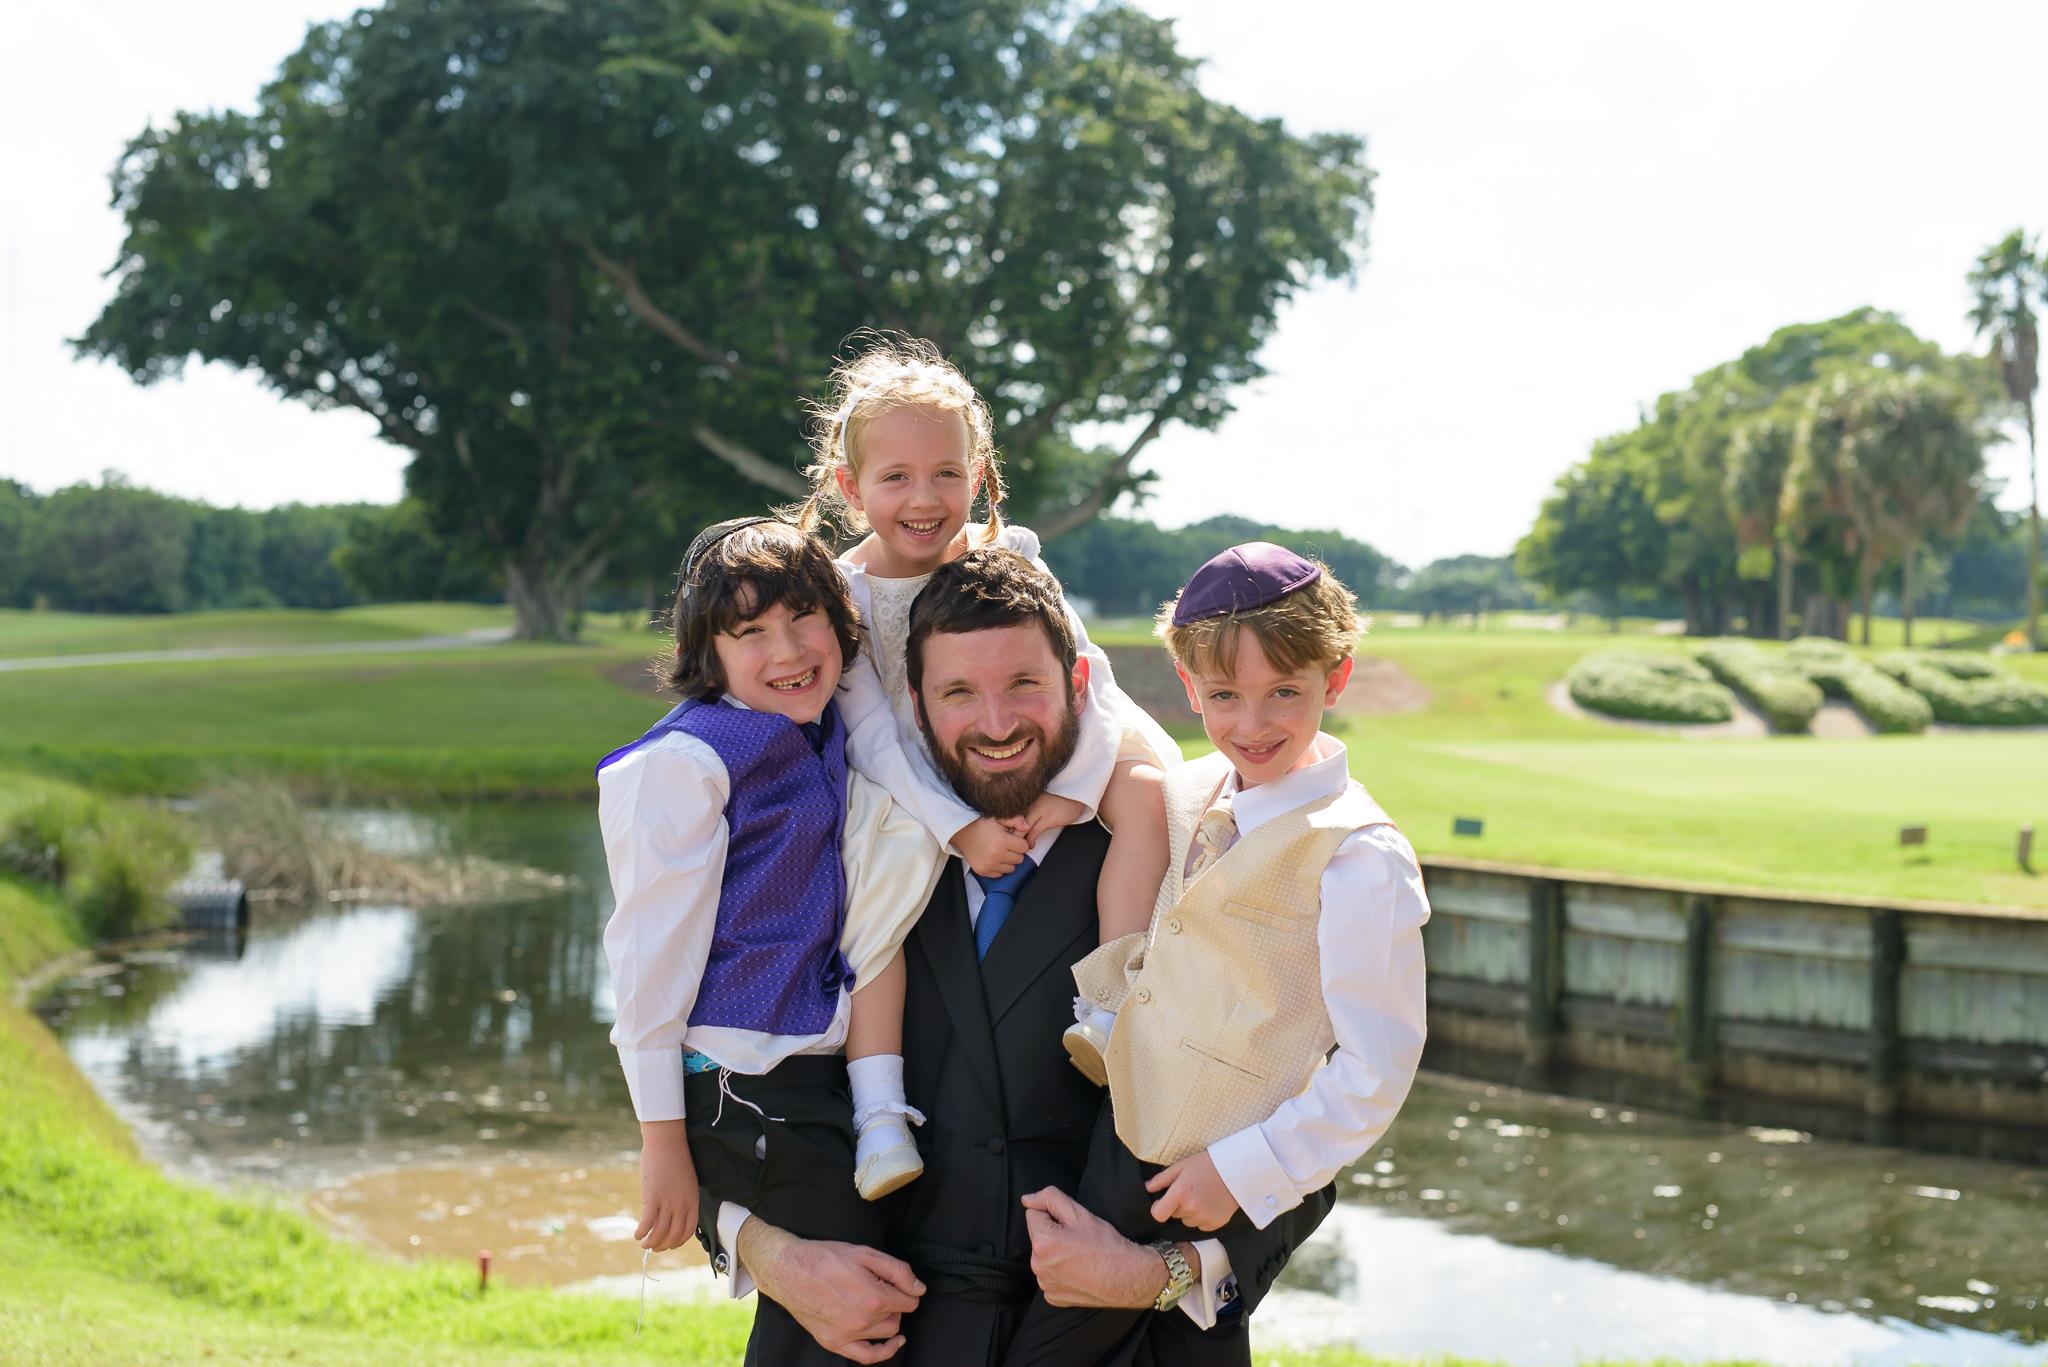 Wedding by Levikfoto.com-016.jpg